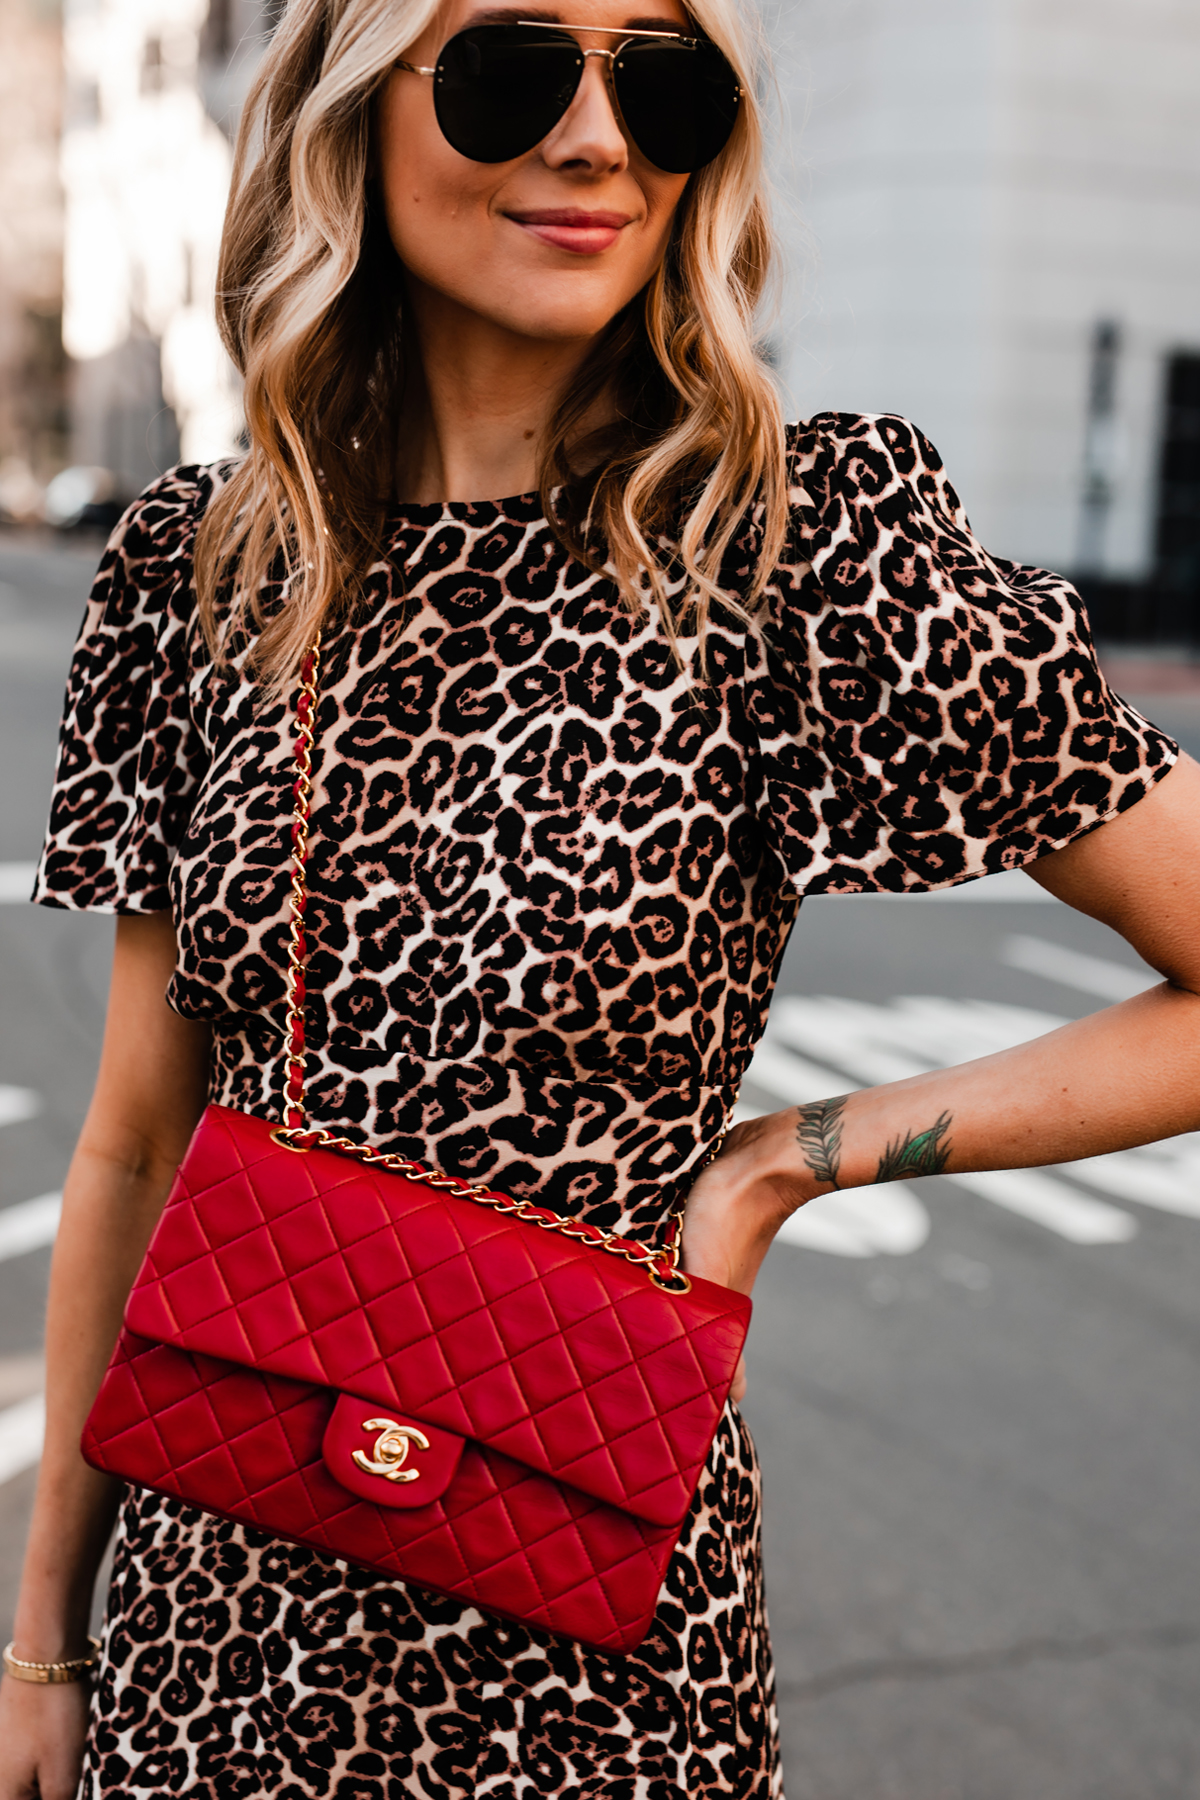 Eye Makeup For Leopard Print Dress